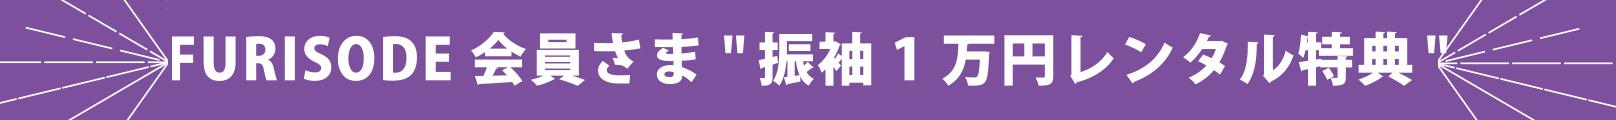 FURISODE会員さま振袖1万円レンタル特典